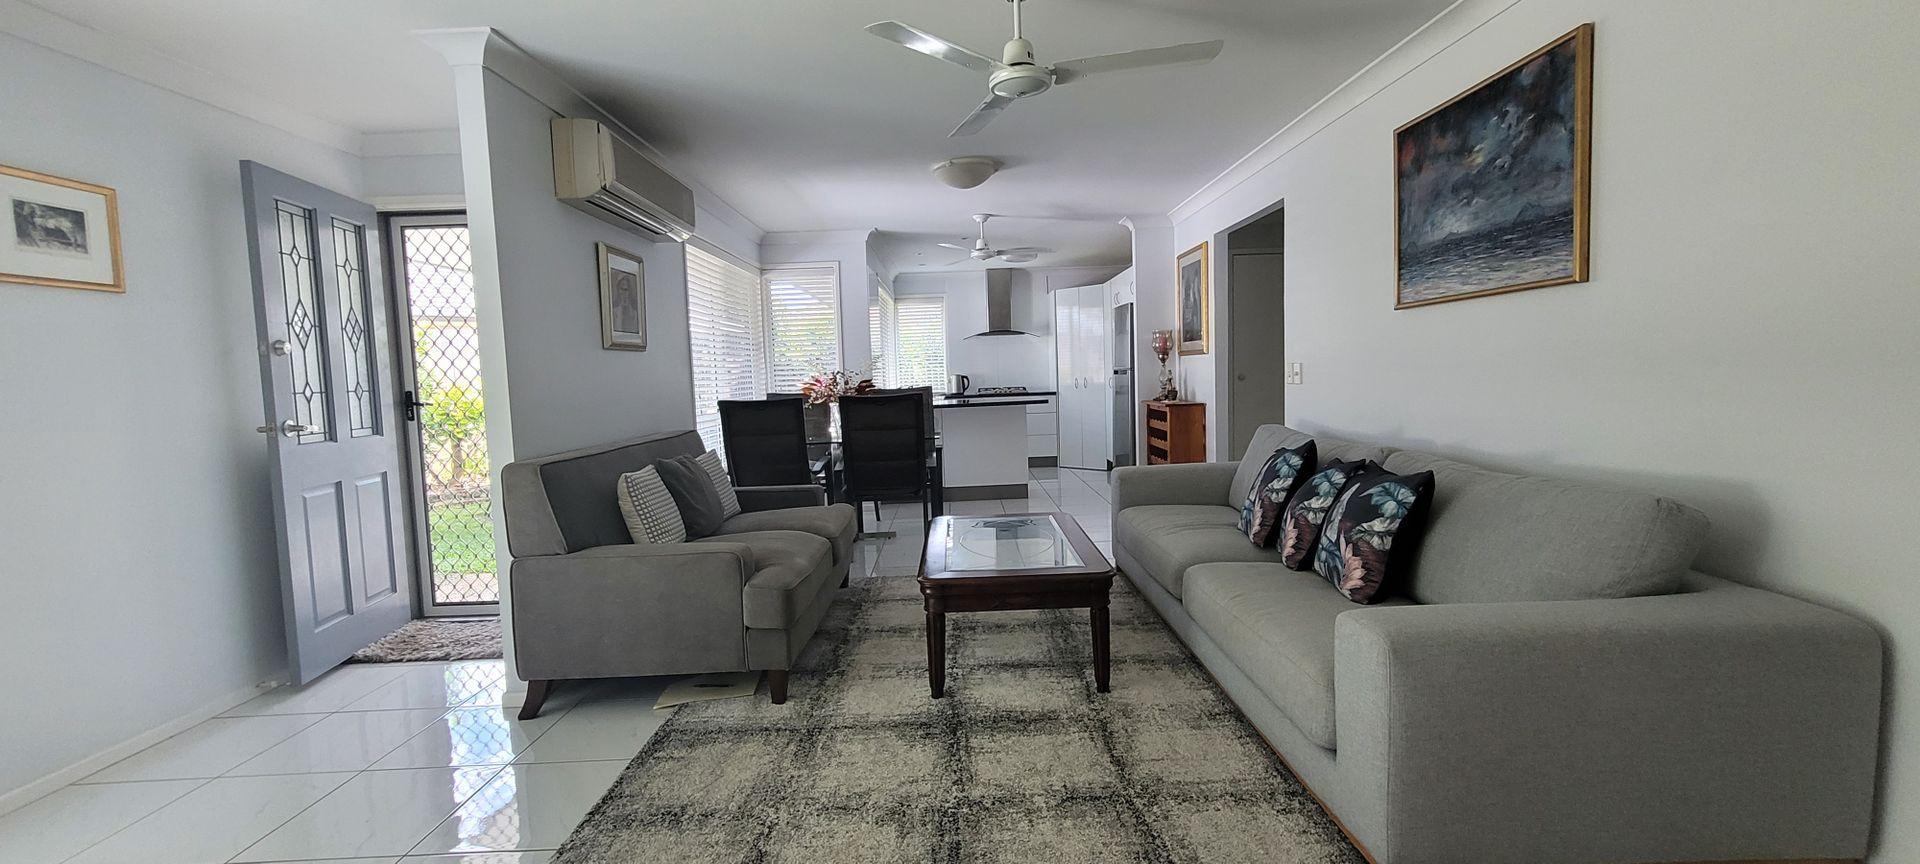 Buderim QLD 4556, Image 1